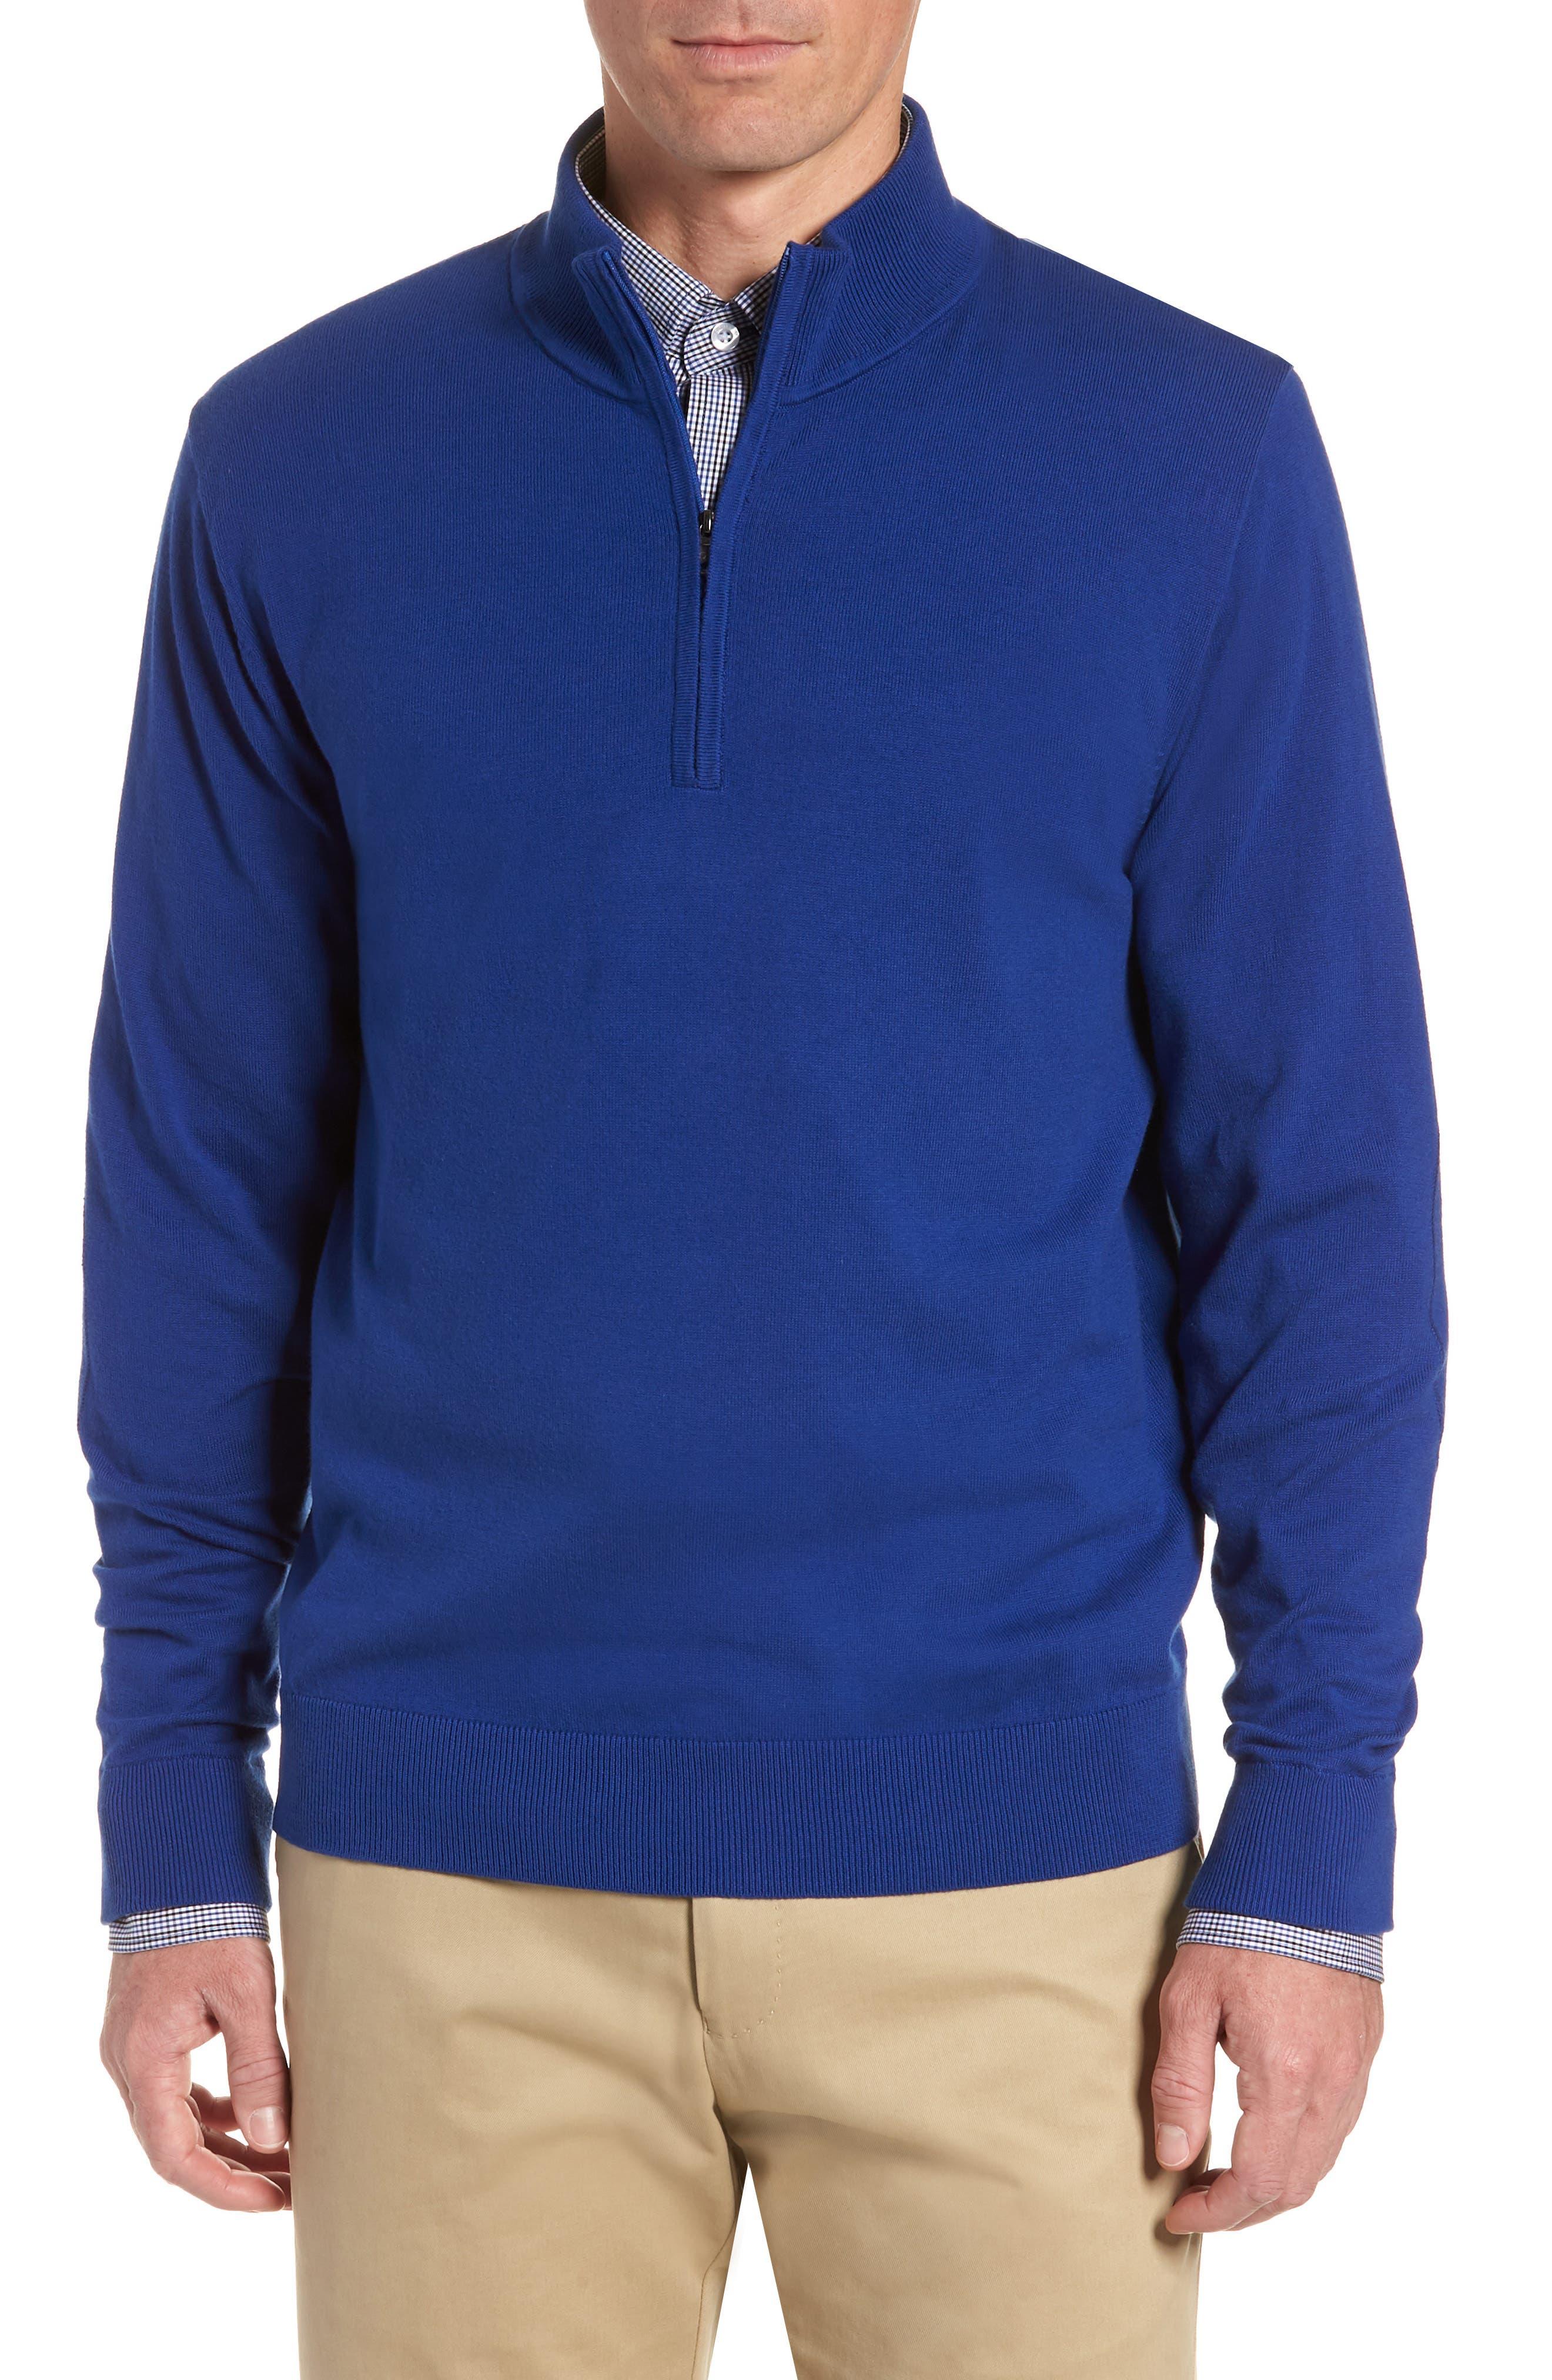 CUTTER & BUCK, Lakemont Half Zip Sweater, Main thumbnail 1, color, 419